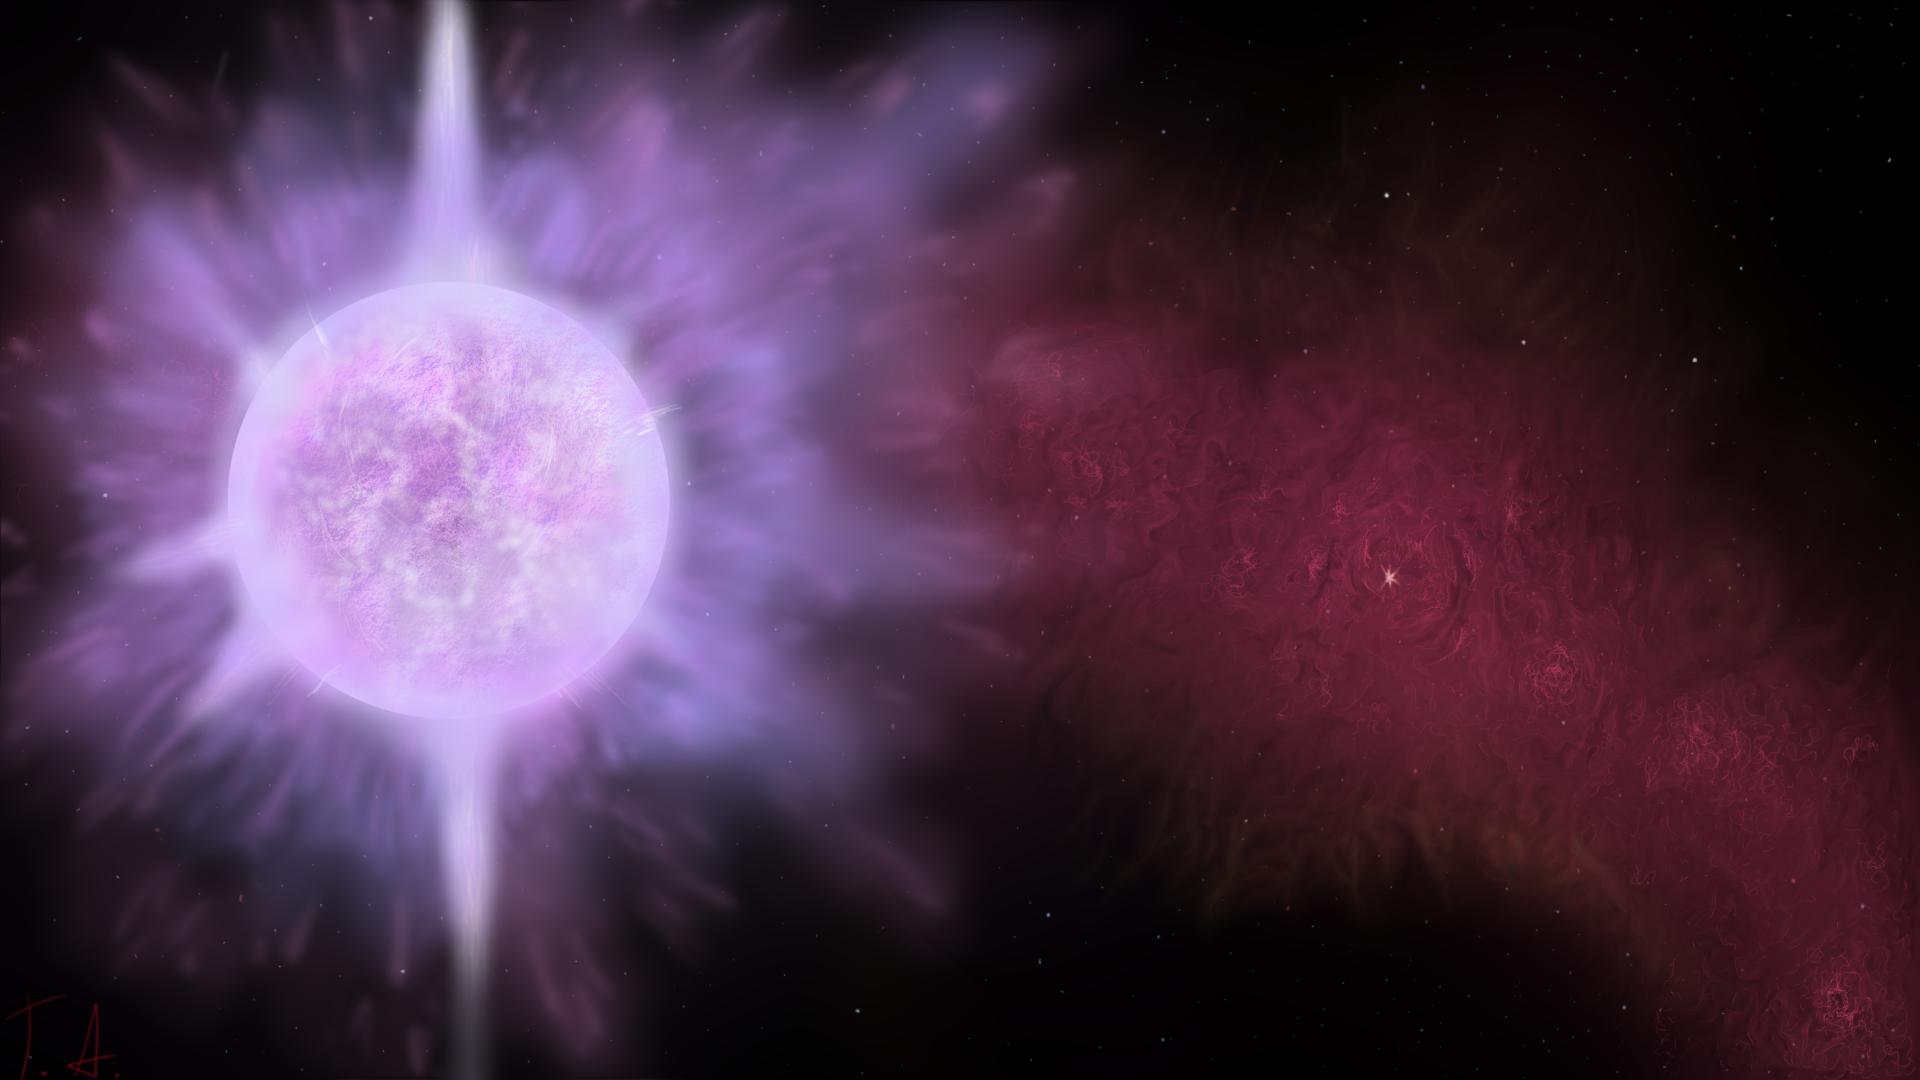 Sci Fi Space Star Sun 1920x1080